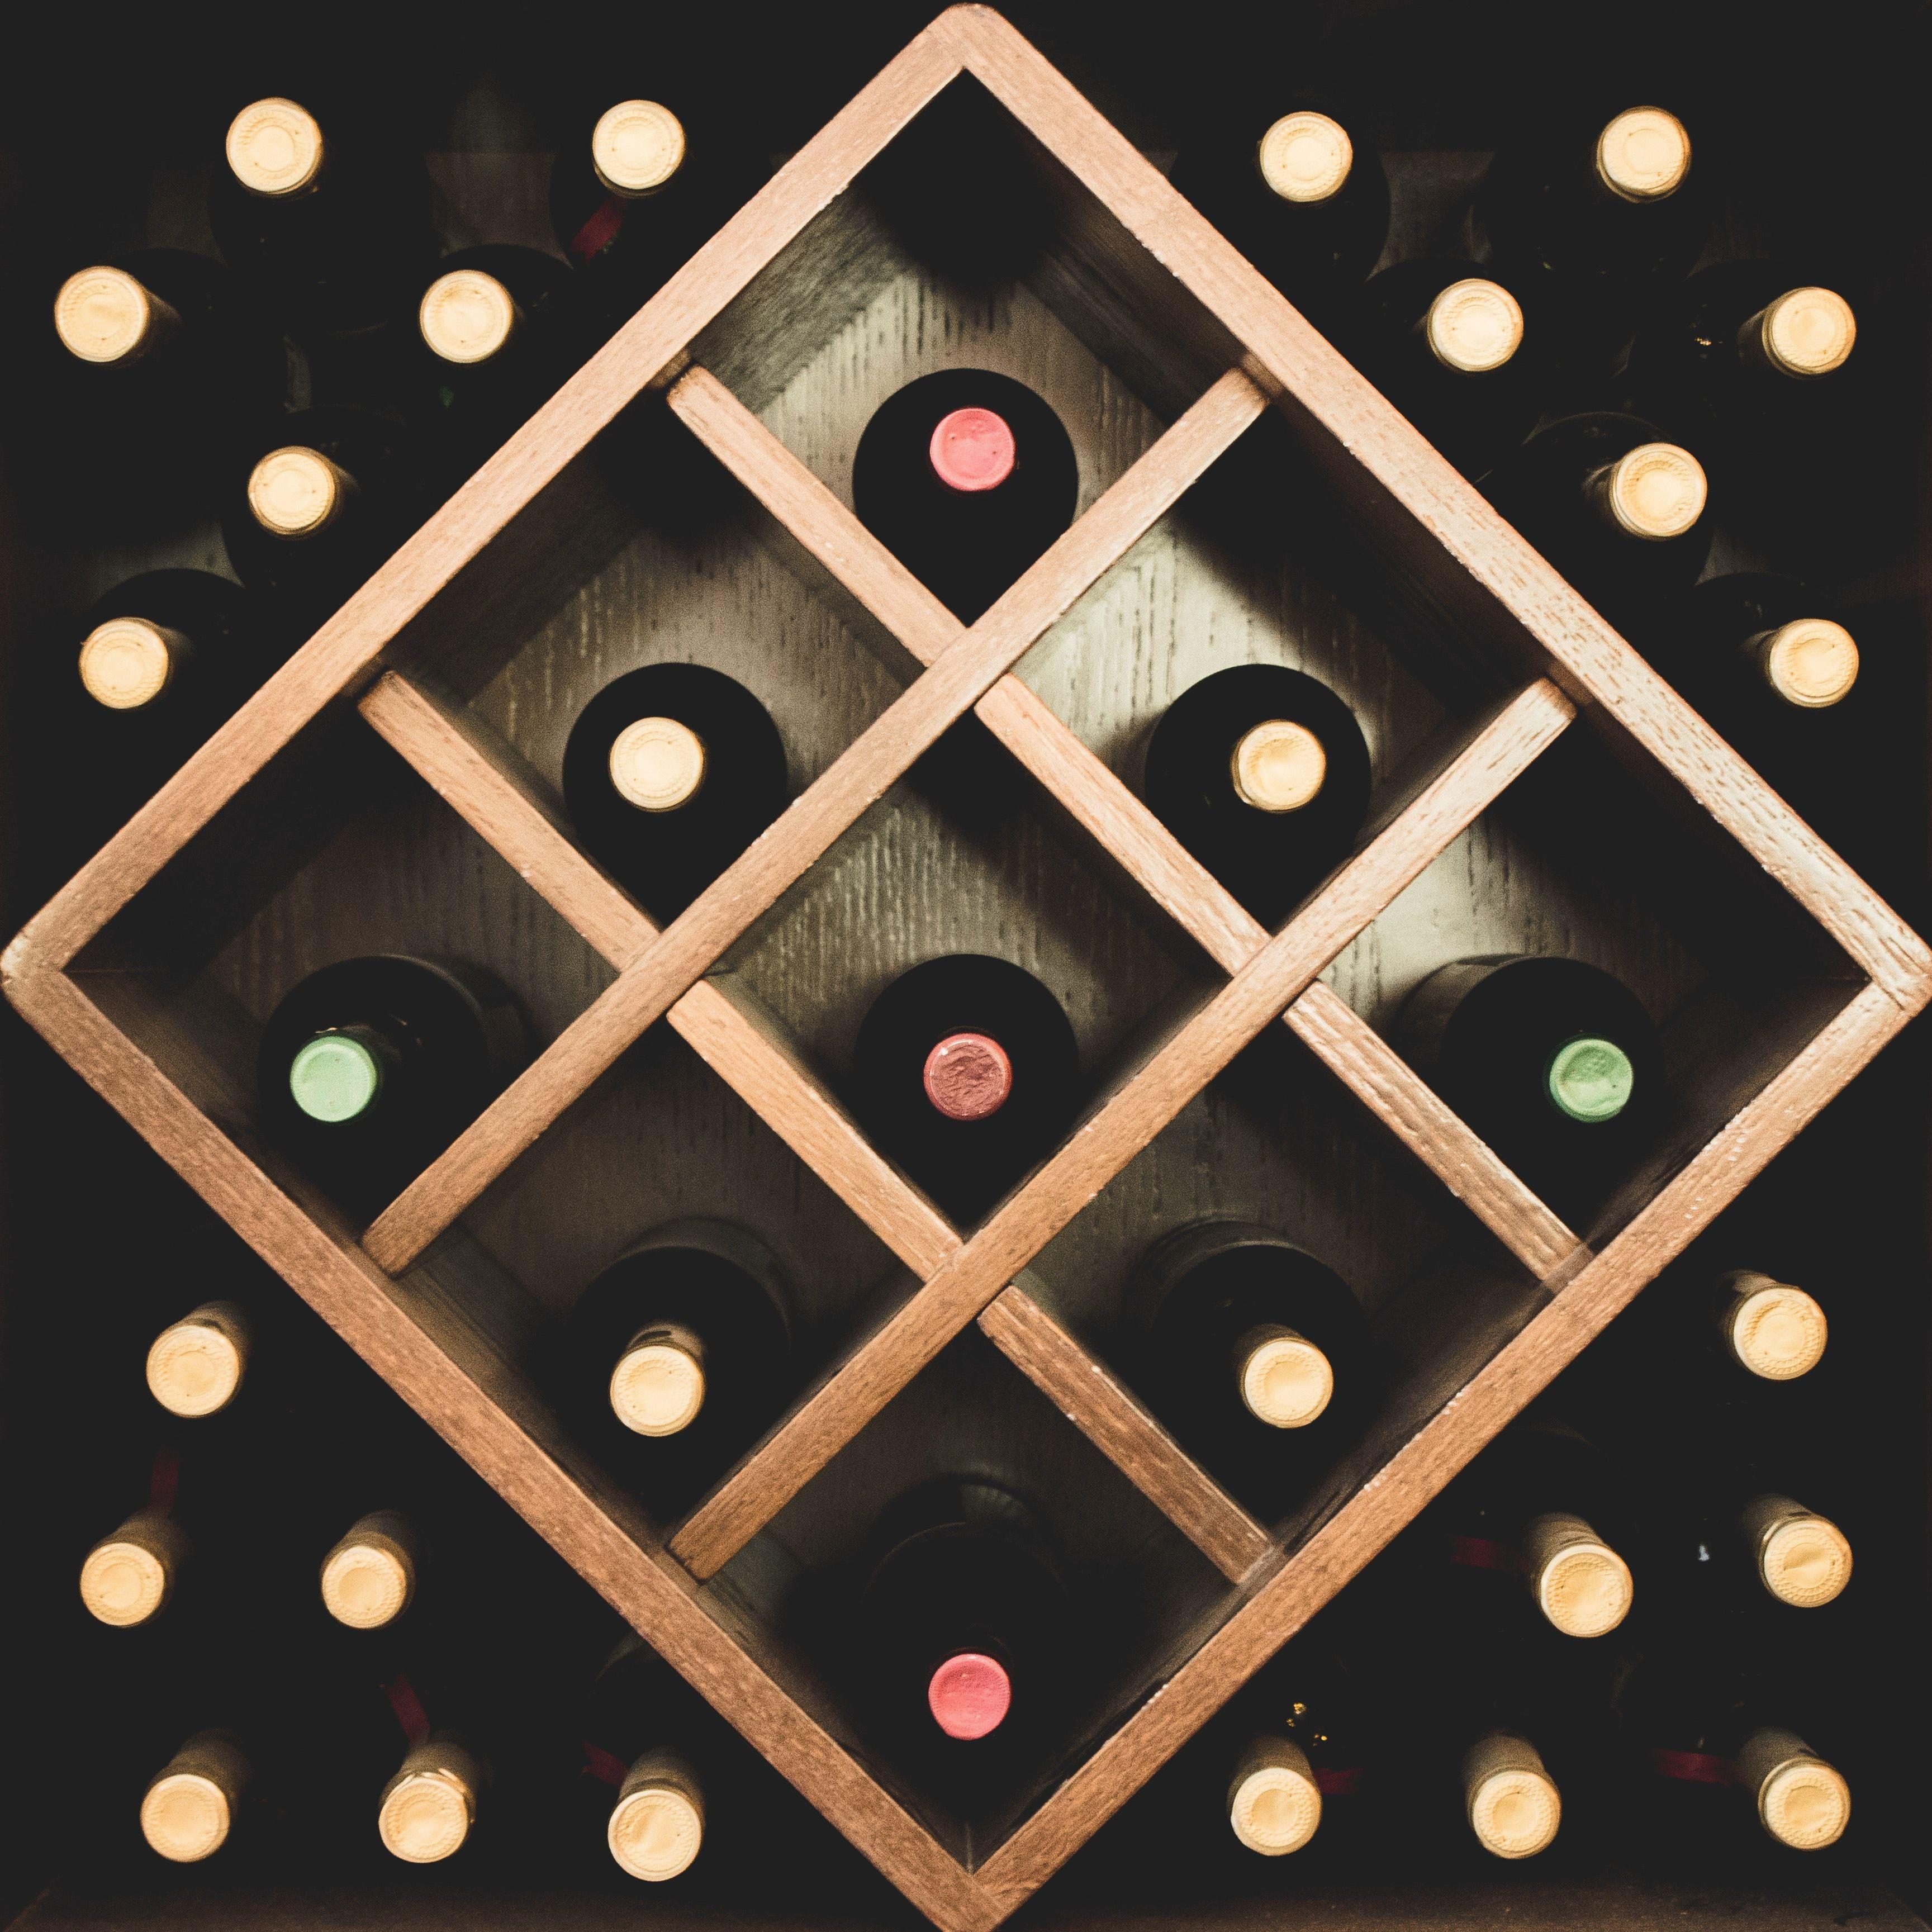 Wine bottles in wooden storage container